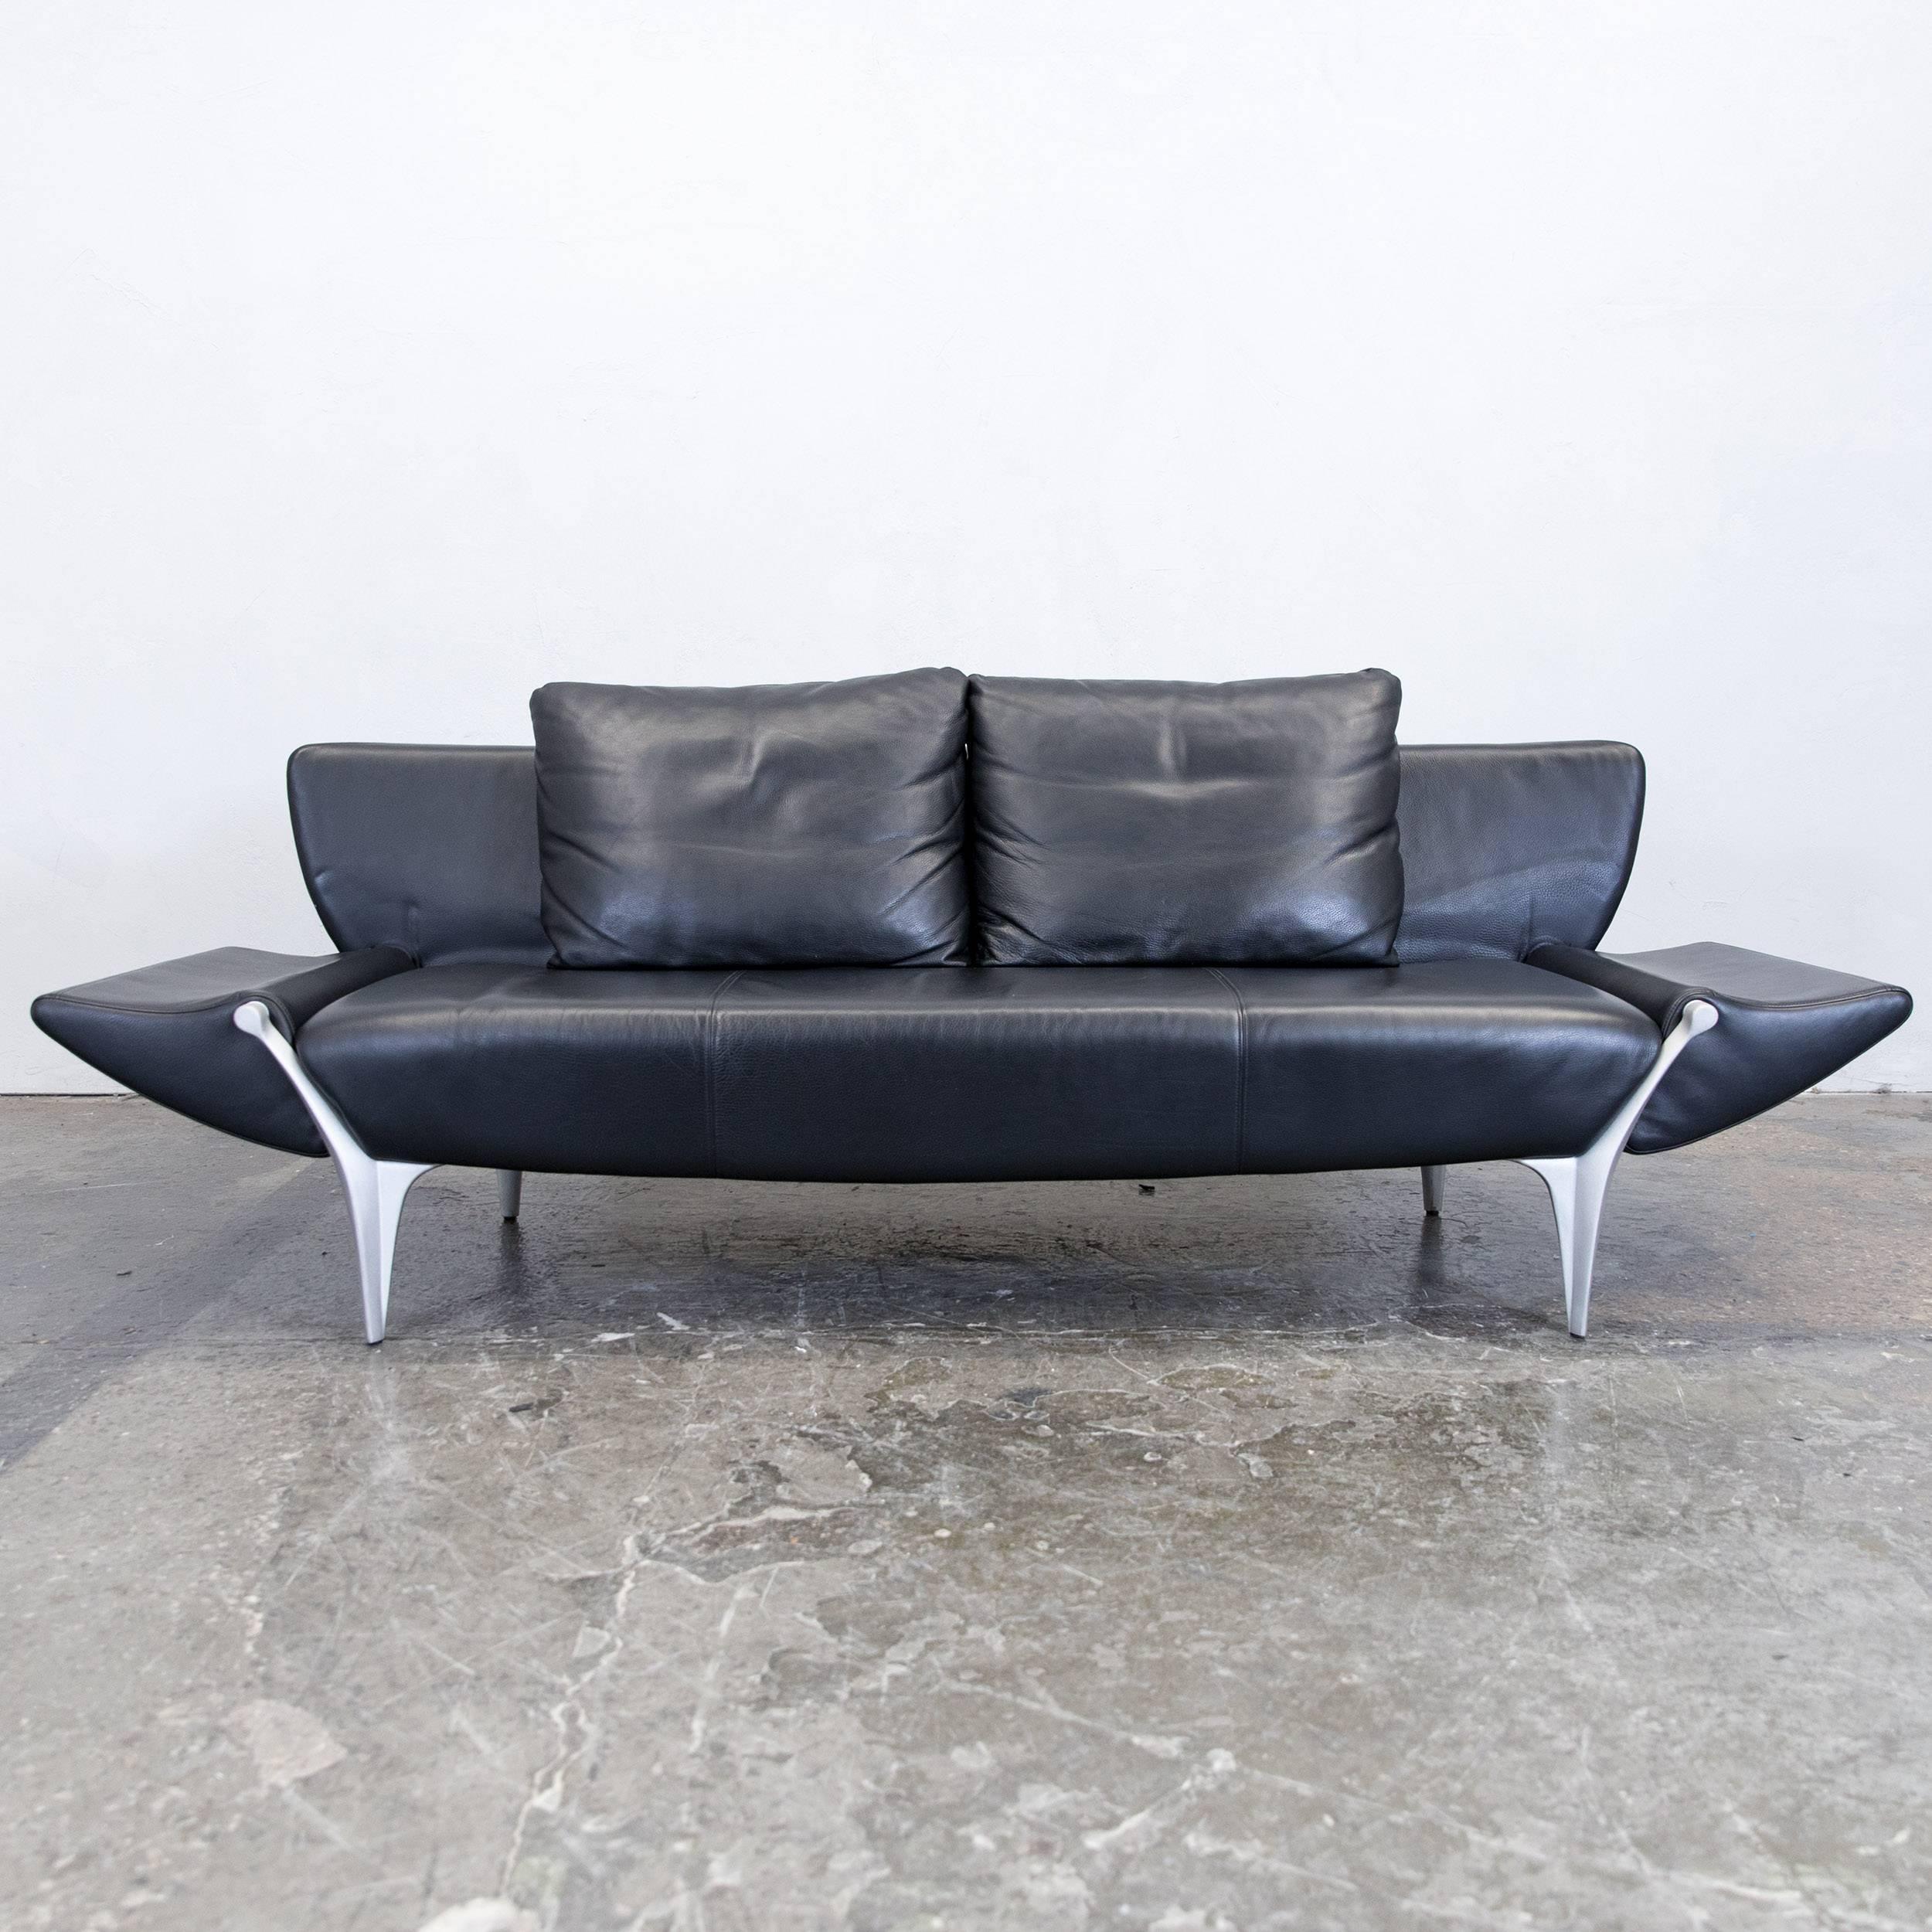 Rolf Benz SOB 1600 Designer Sofa Leather Black Three-Seat Function ...